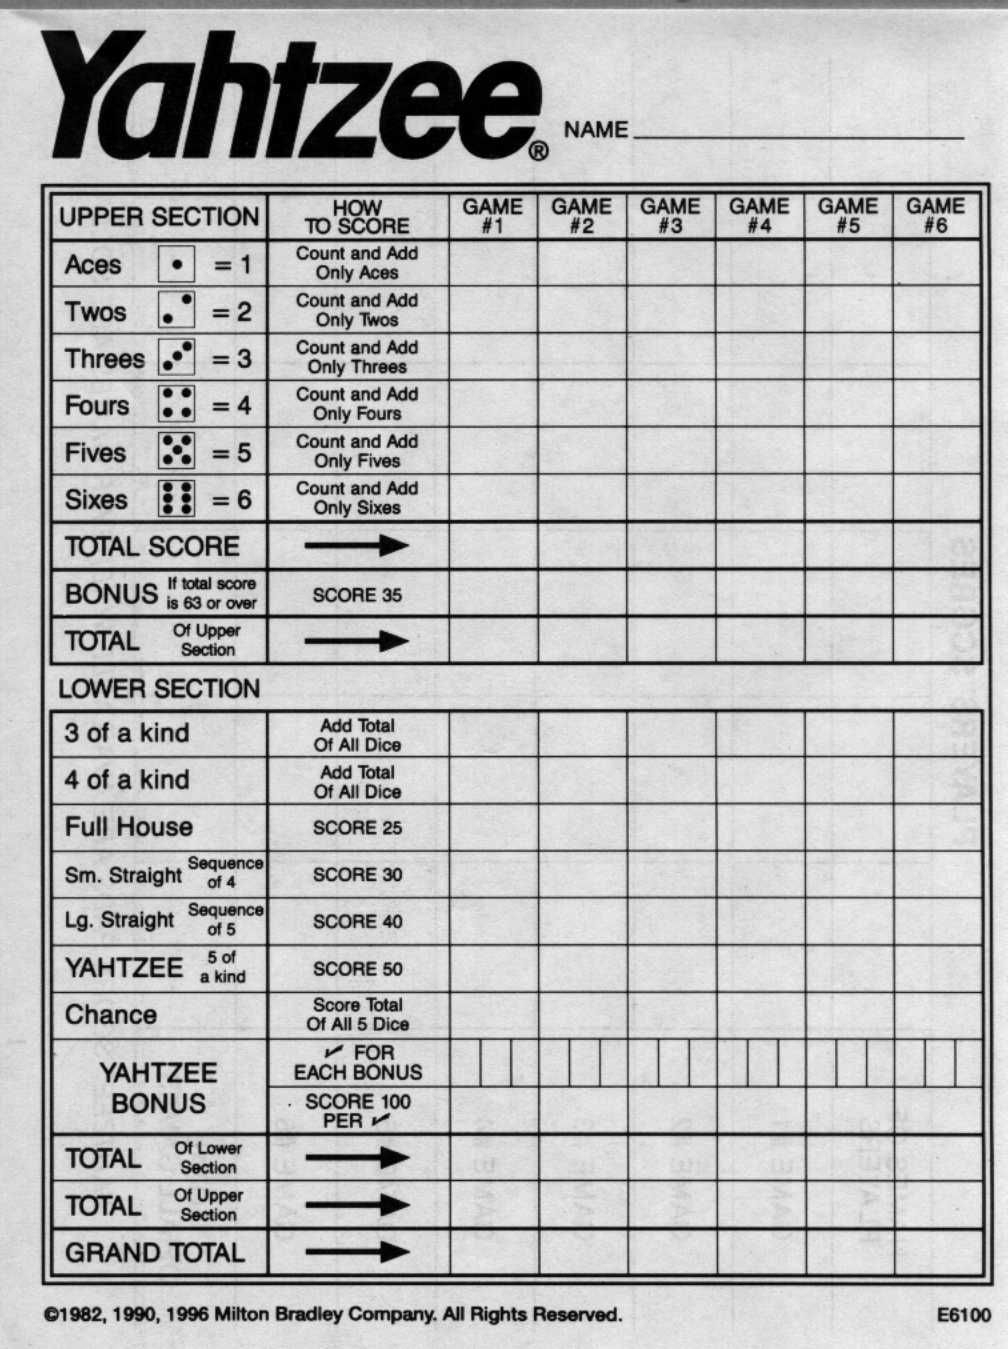 Yahtzee Score Sheets Free Printable | Blank Yahtzee Score Sheet - Free Printable Yahtzee Score Sheets